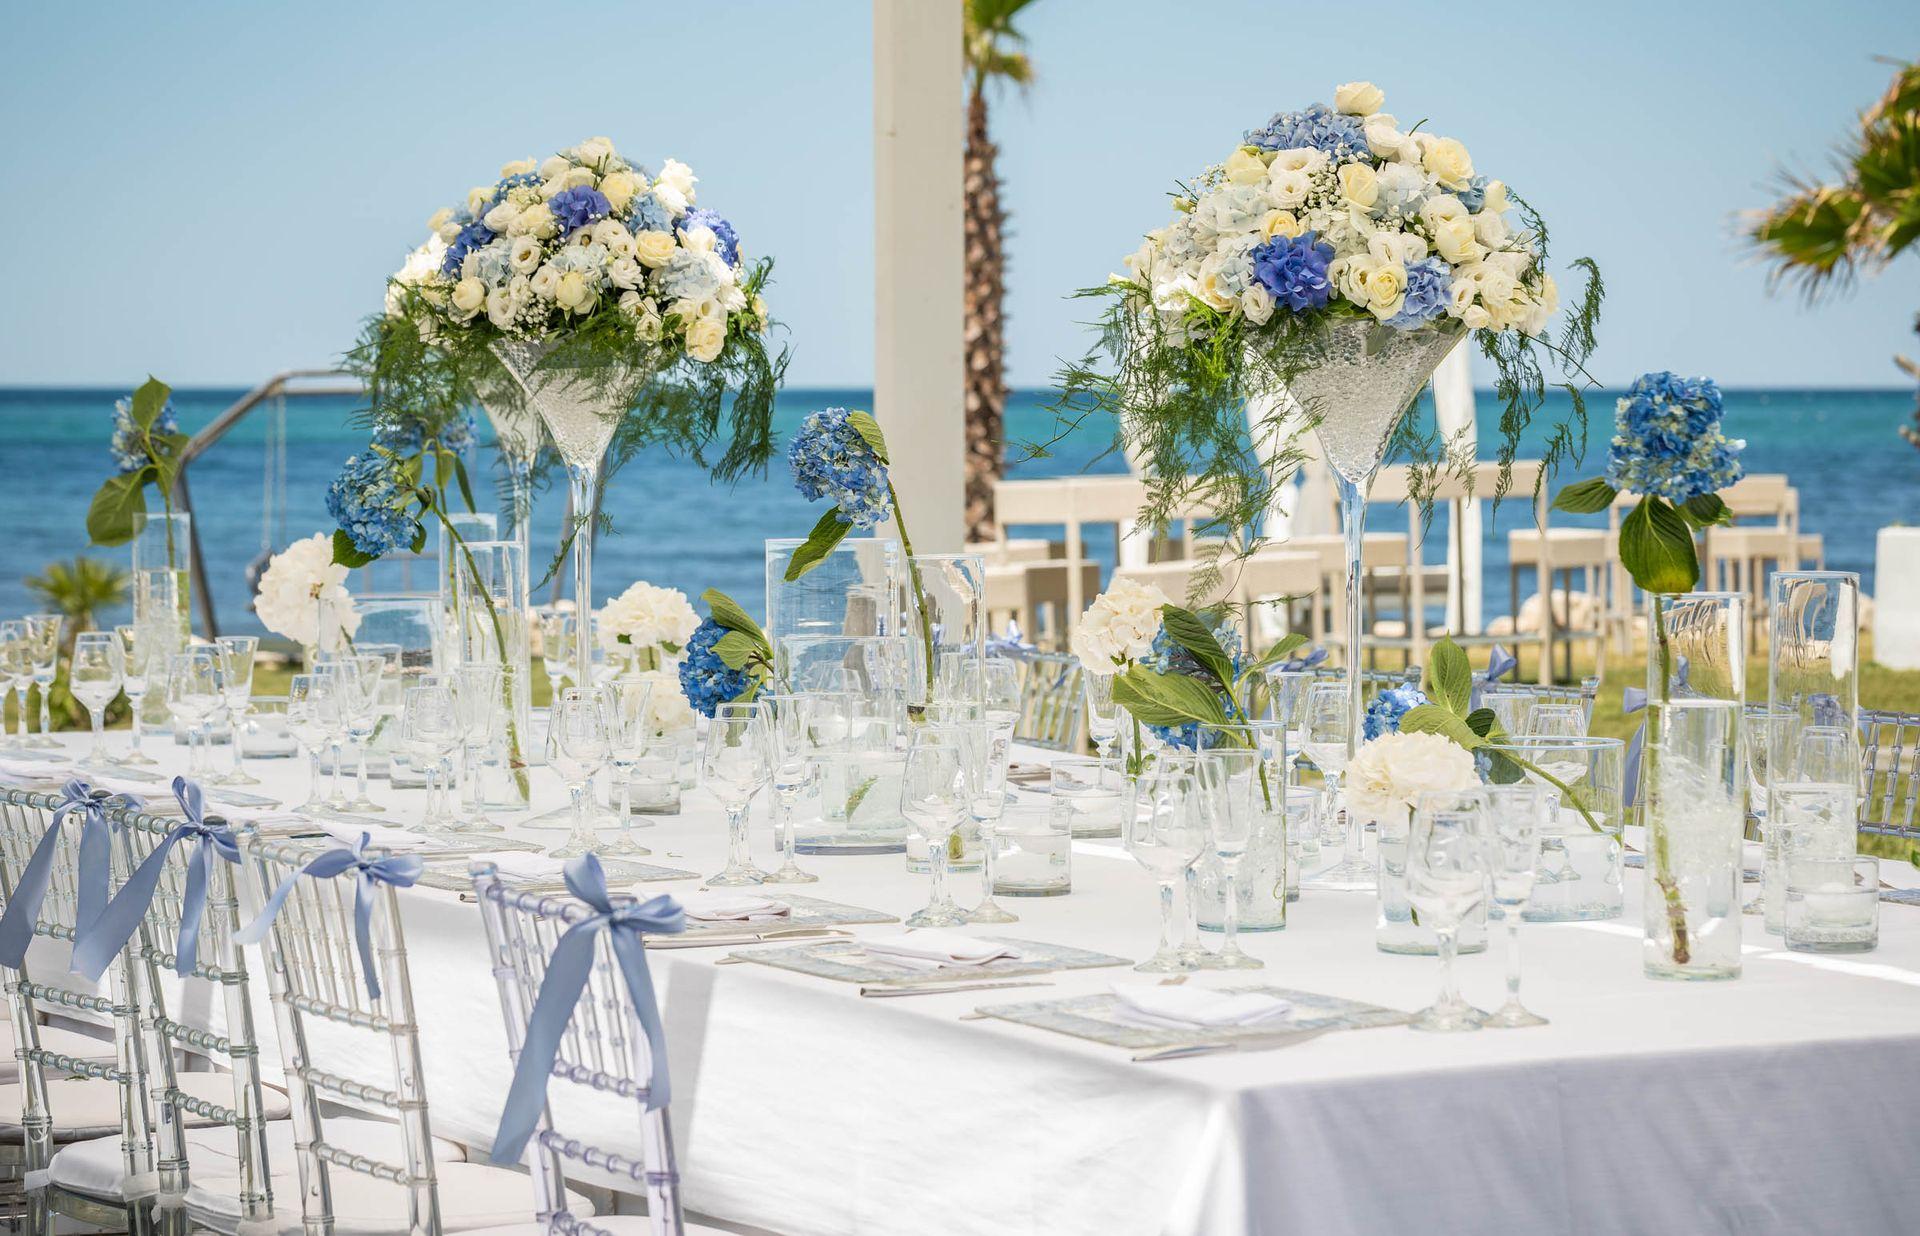 Location Matrimonio Spiaggia Napoli : Location per matrimoni key wedding pozzuoli napoli